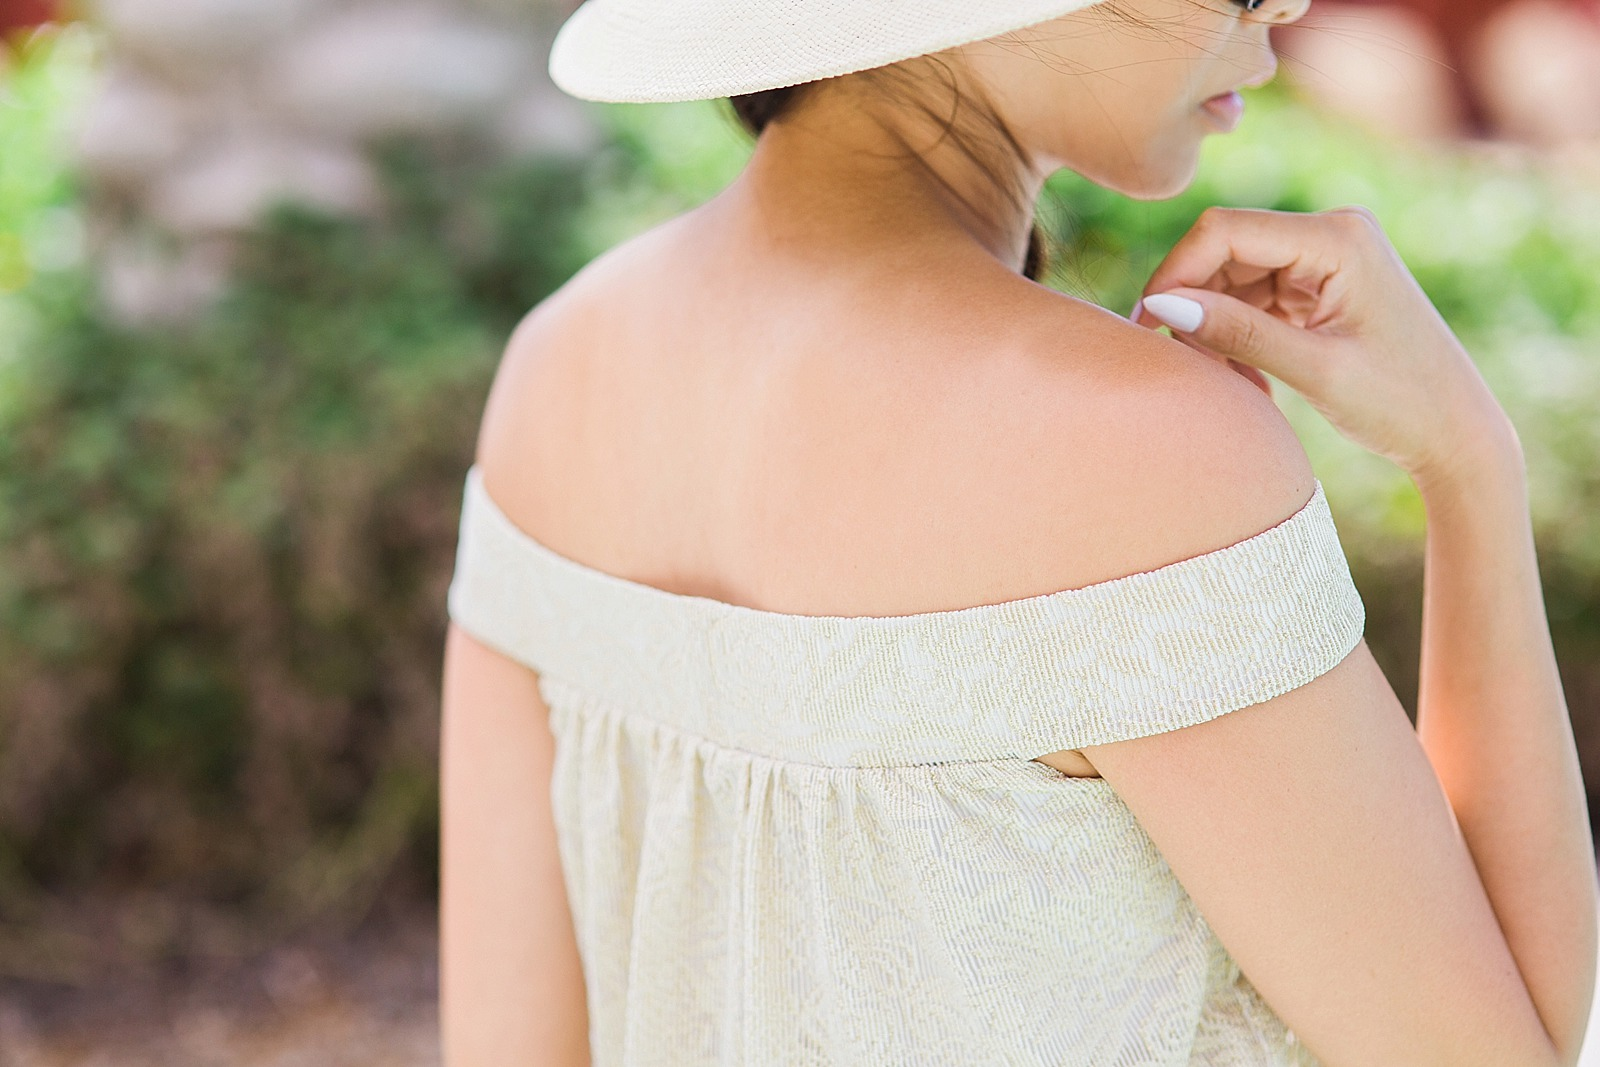 off-shoulder-bikini-riot-swimsuit-casino-del-sol-diana-elizabeth-blog-lifestyle-blogger-style_0047